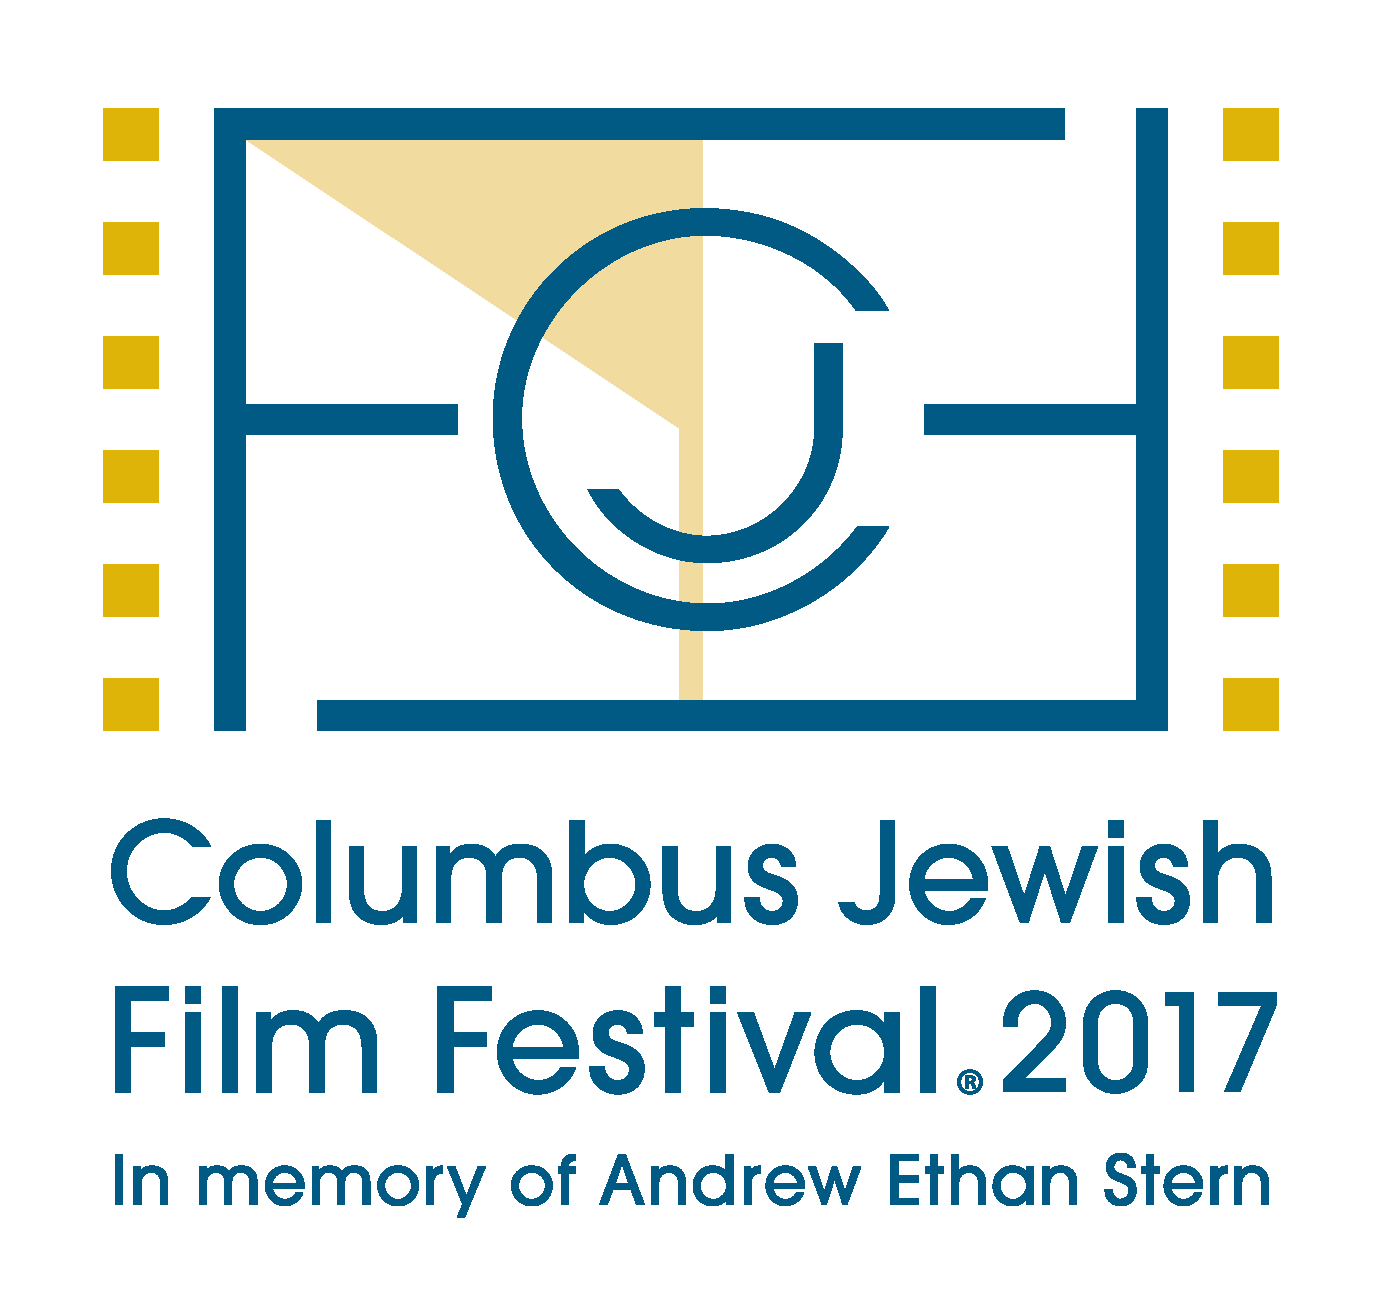 Columbus jewish film festival. Schedule clipart annual leave